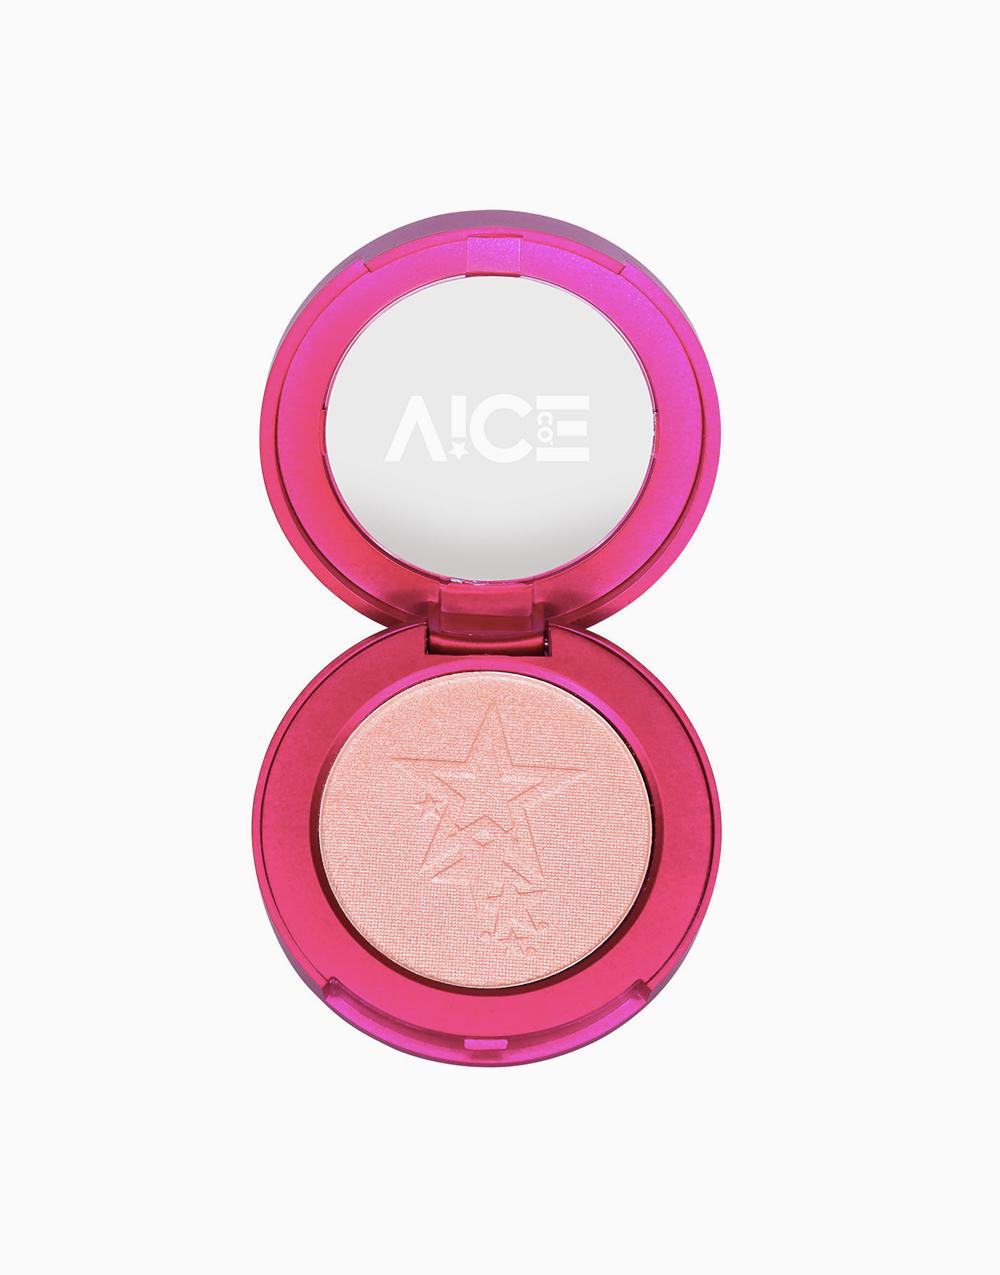 Aura Glow (3.5g) by Vice Cosmetics | Splendid